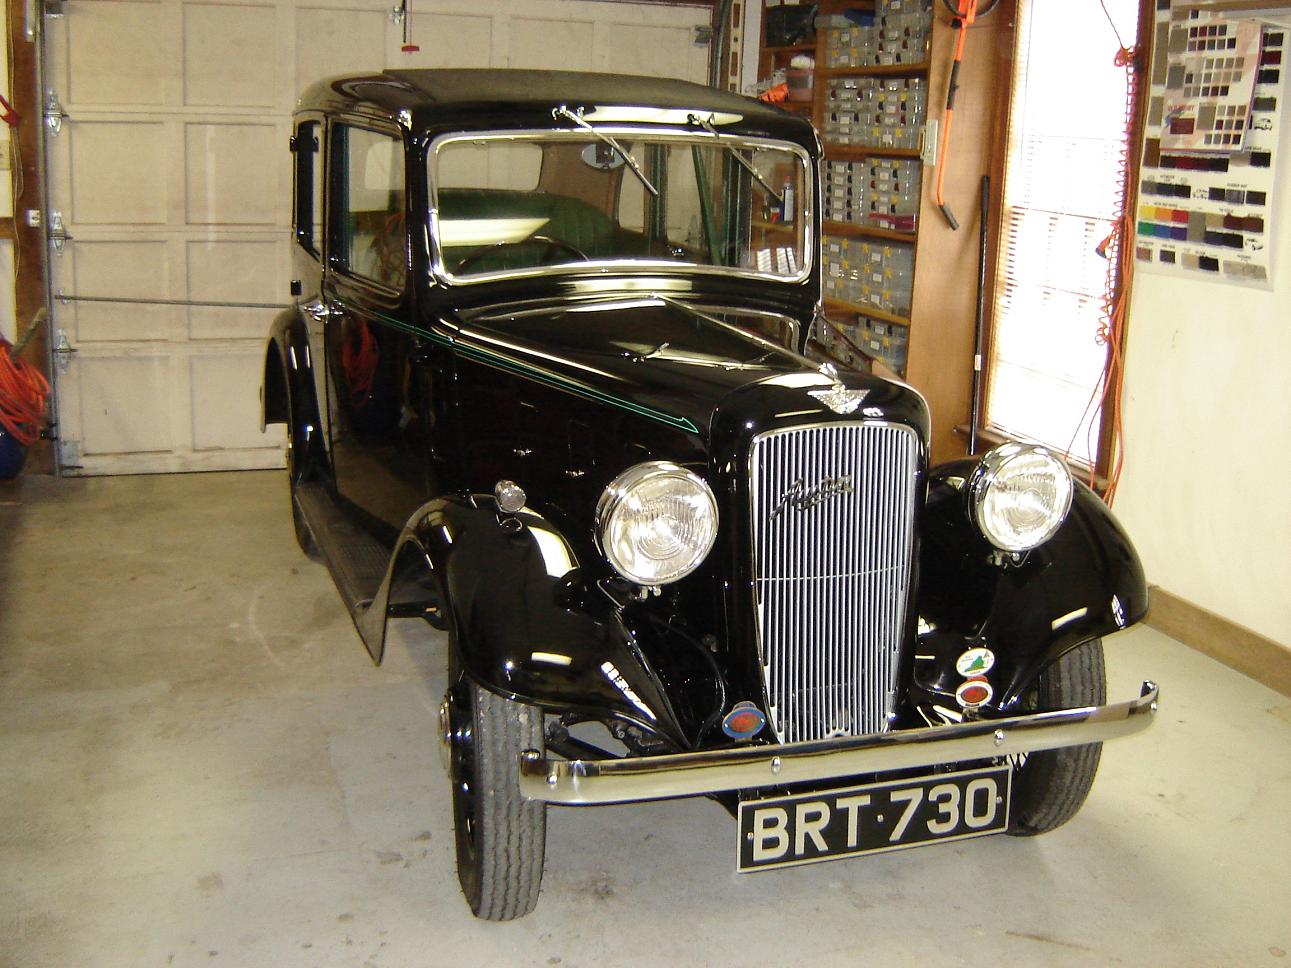 1936-Austin-10-Sherborne-Saloon-a1